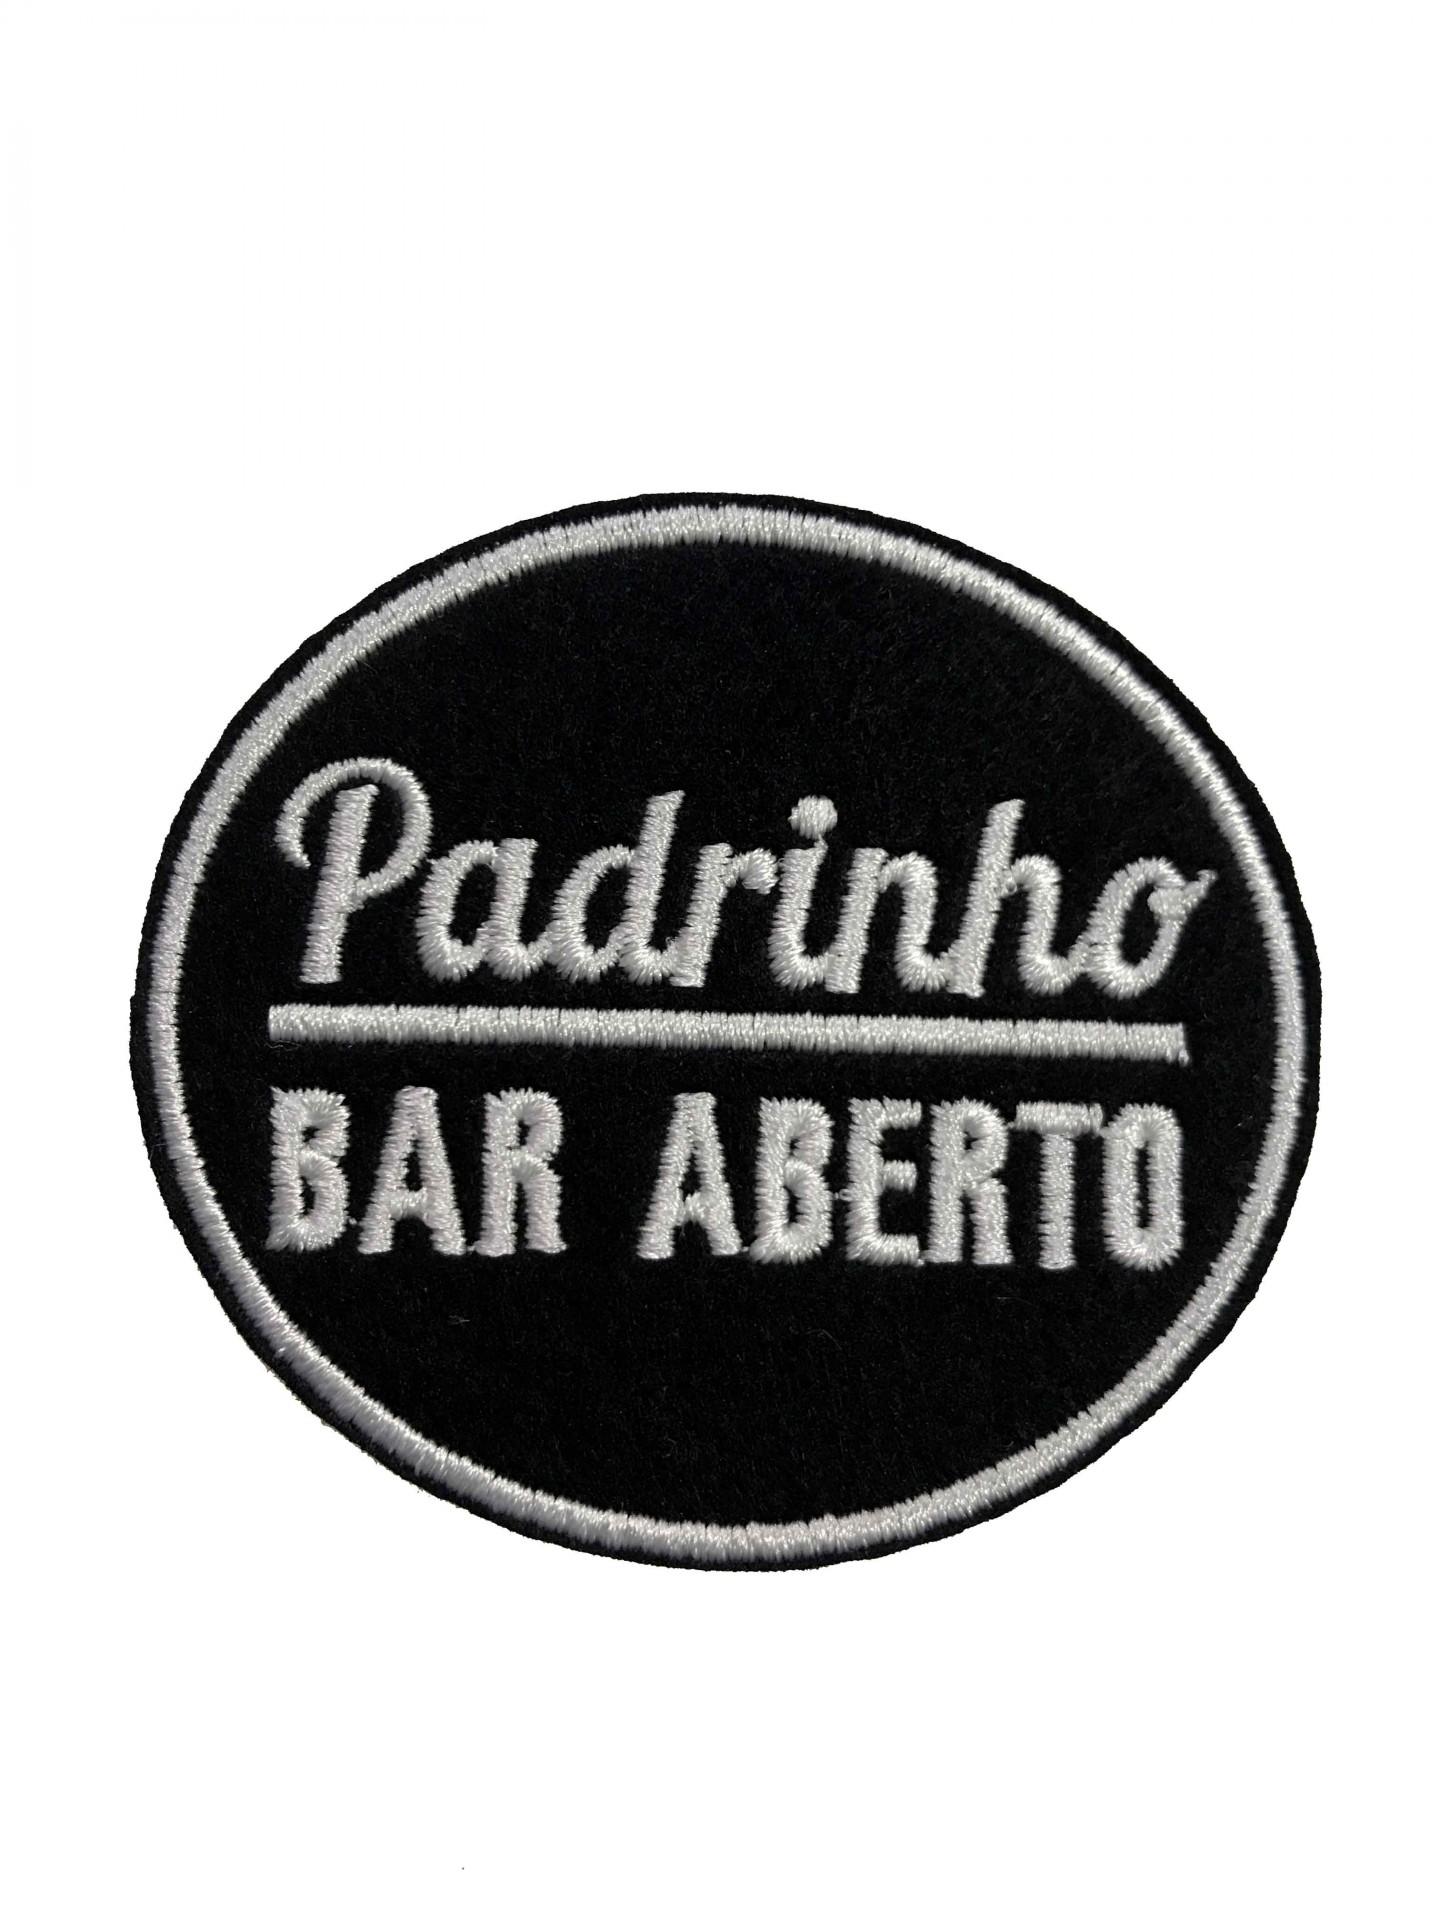 Emblema Padrinho - bar aberto